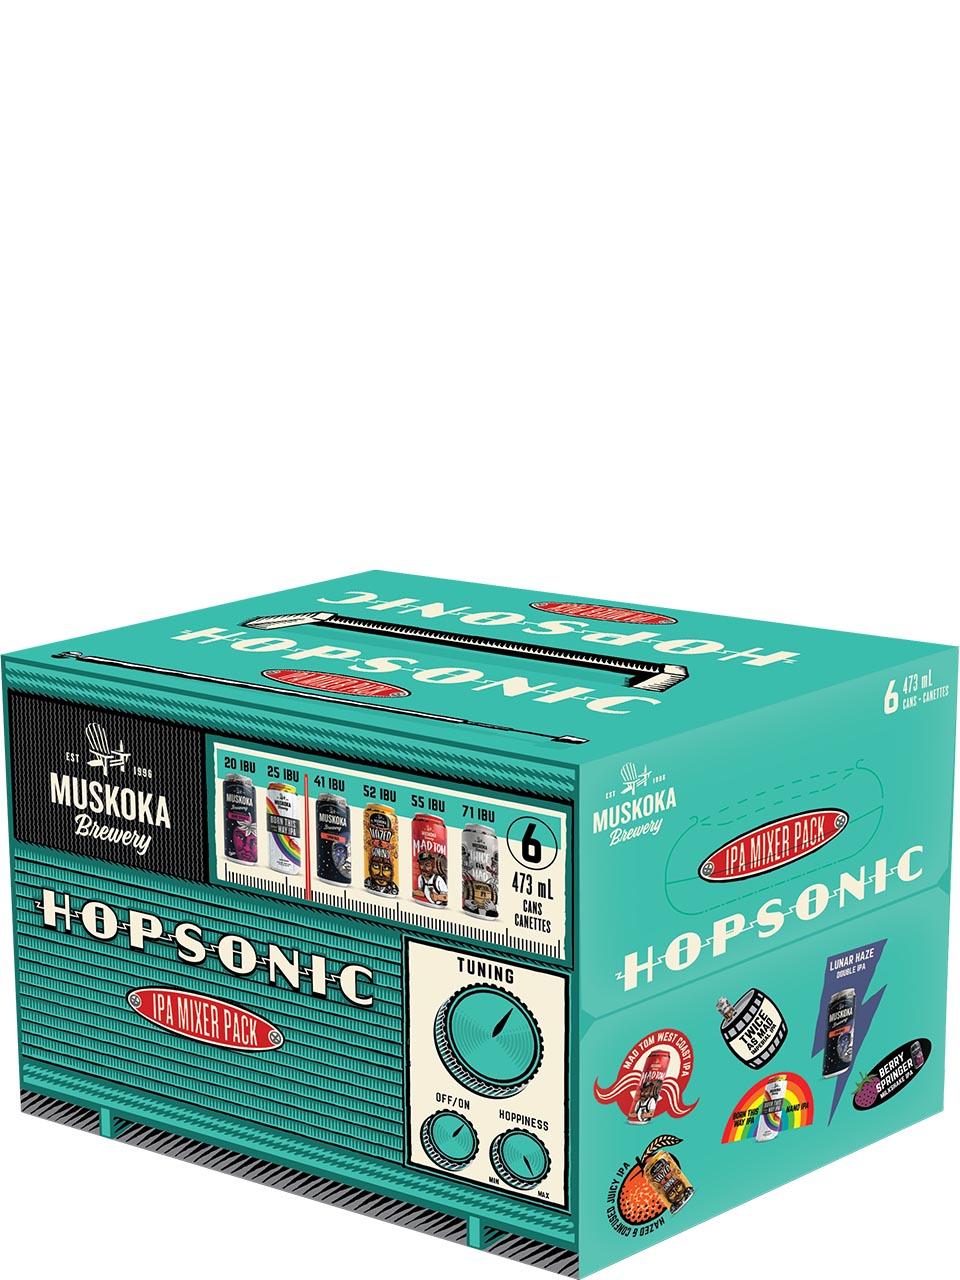 Muskoka Hopsonic IPA Mixer Pack 6 Pack Cans